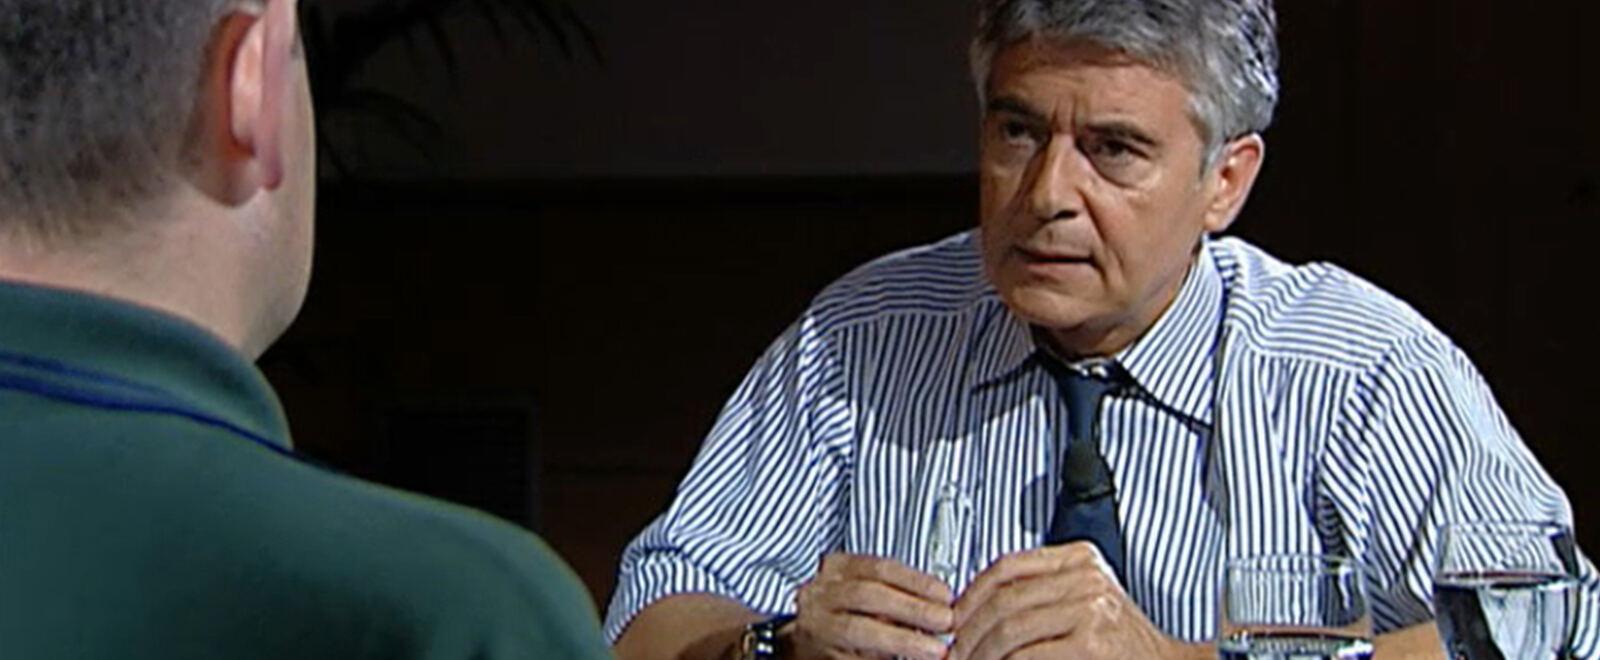 Claudio martelli racconta walter tobagi '04